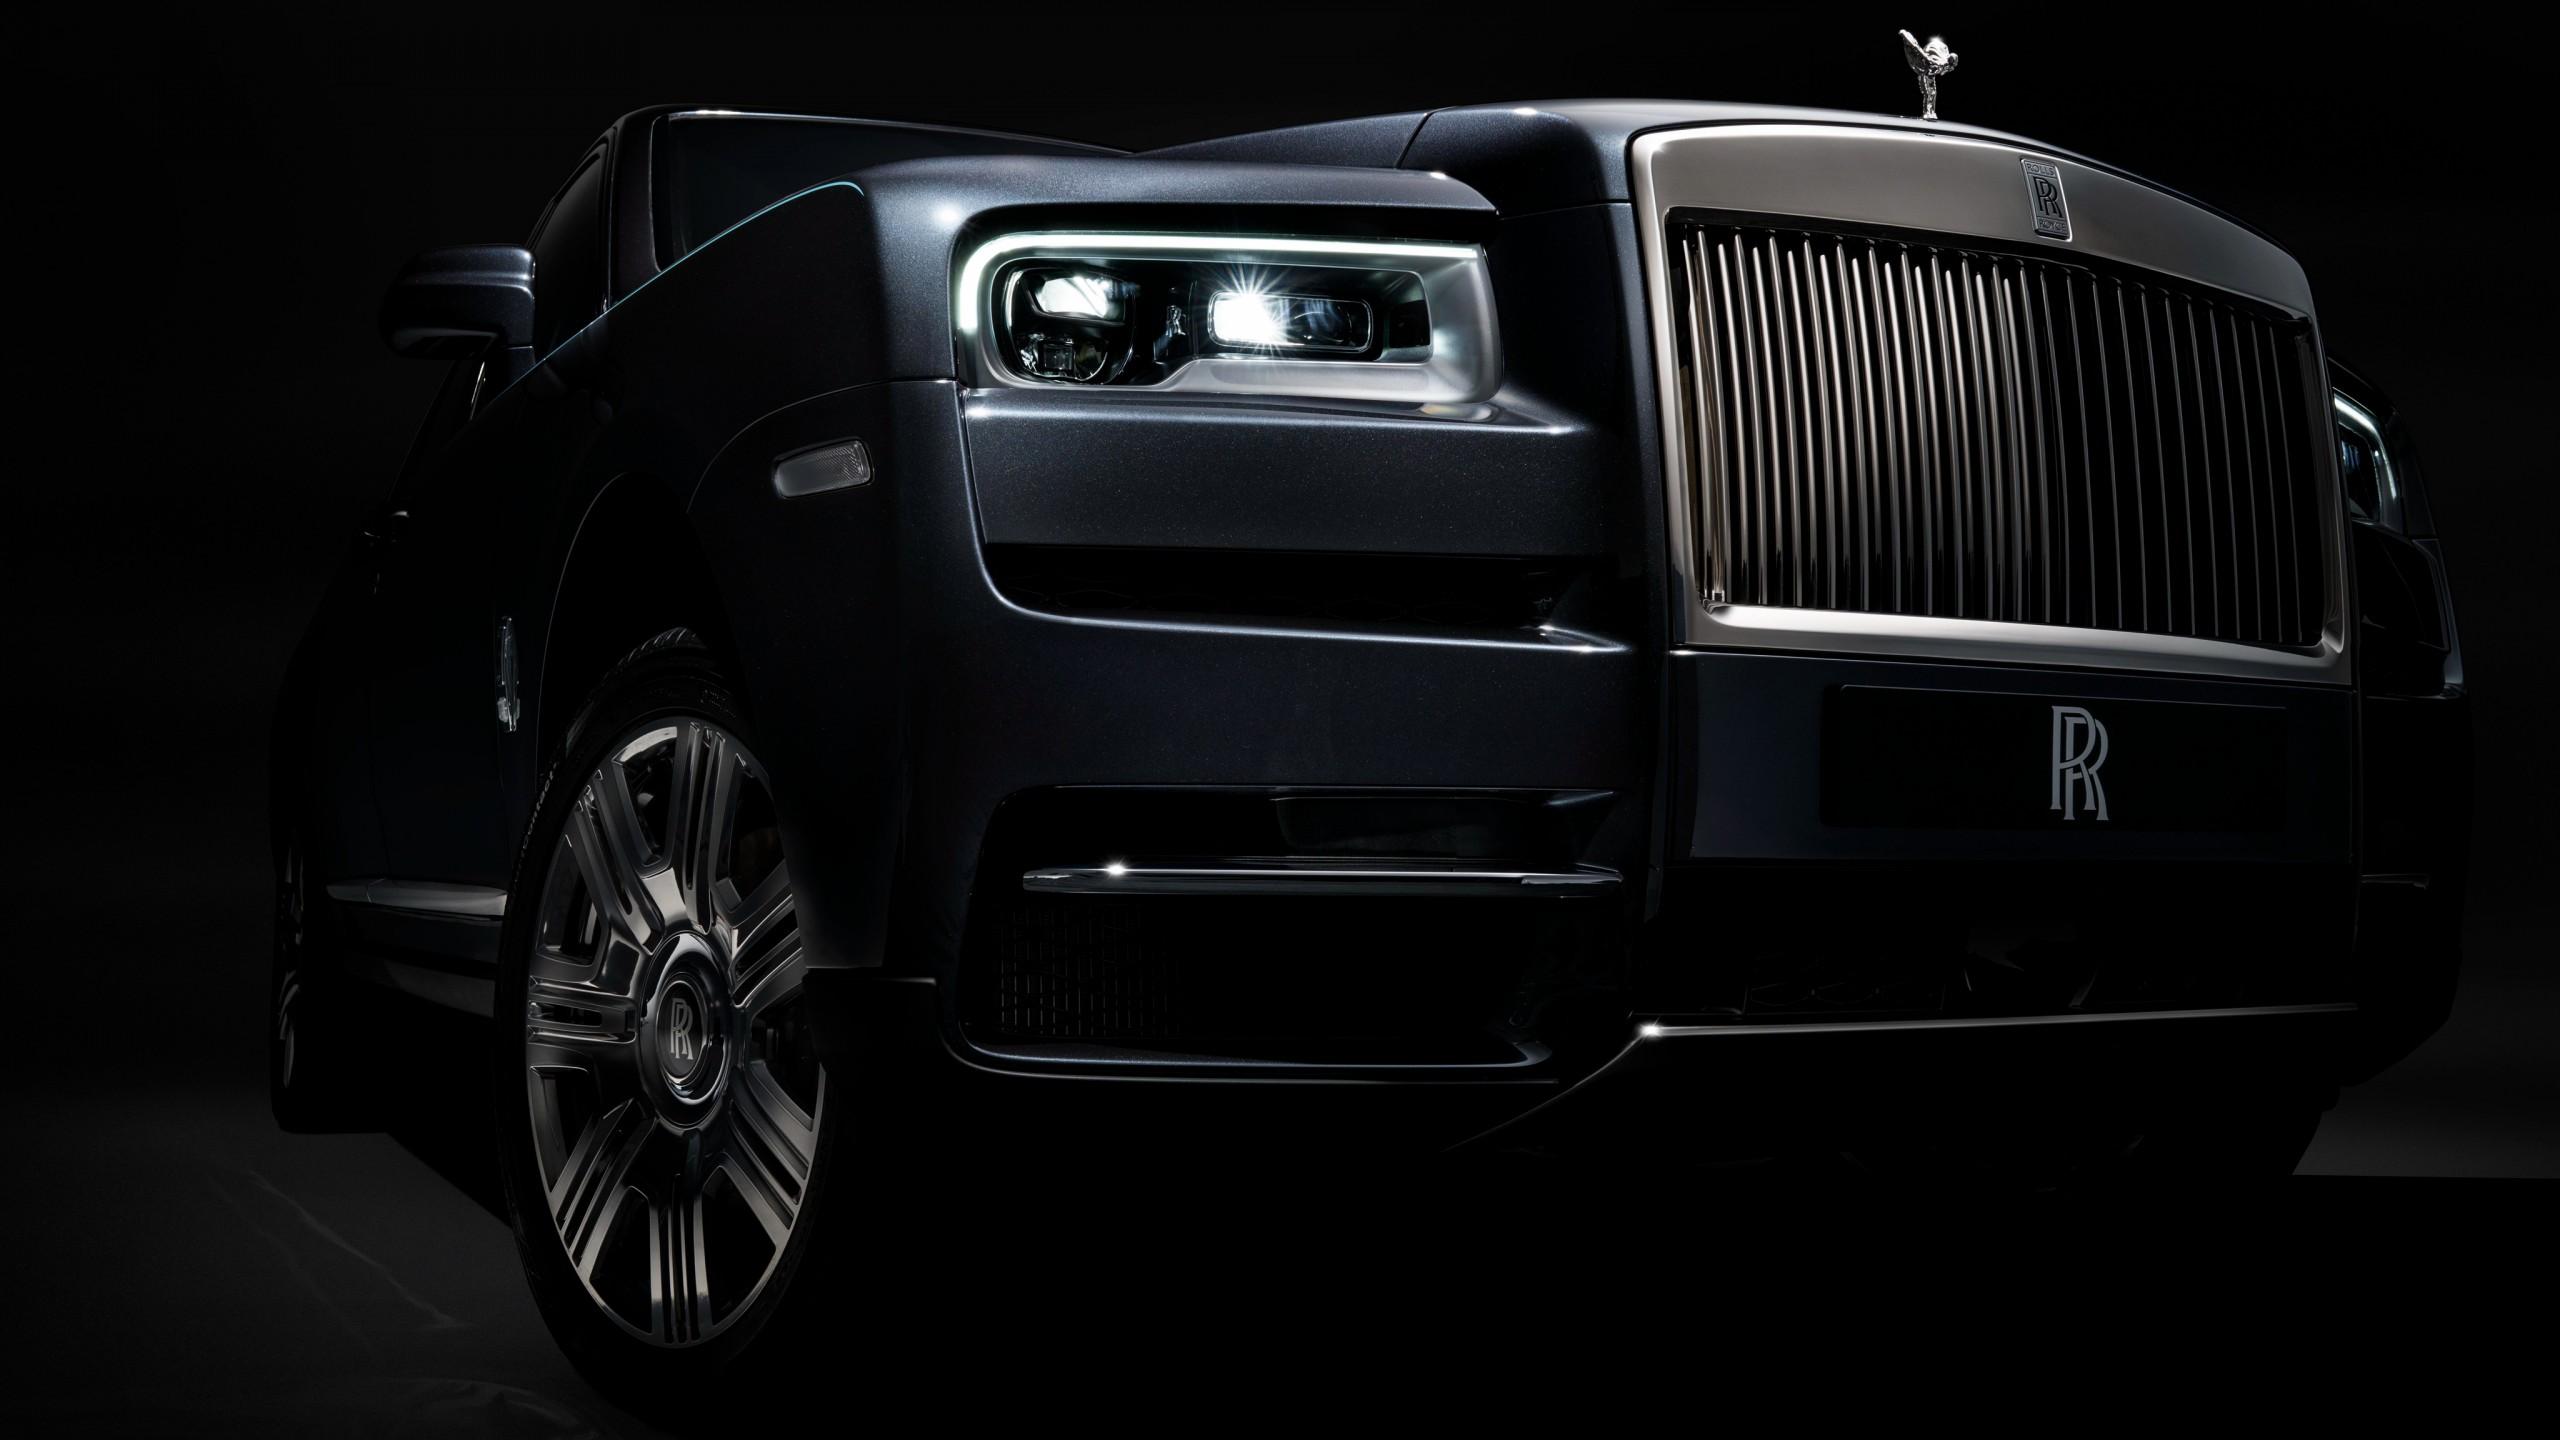 2018 Rolls-Royce Cullinan 4K 5 Wallpaper | HD Car ...